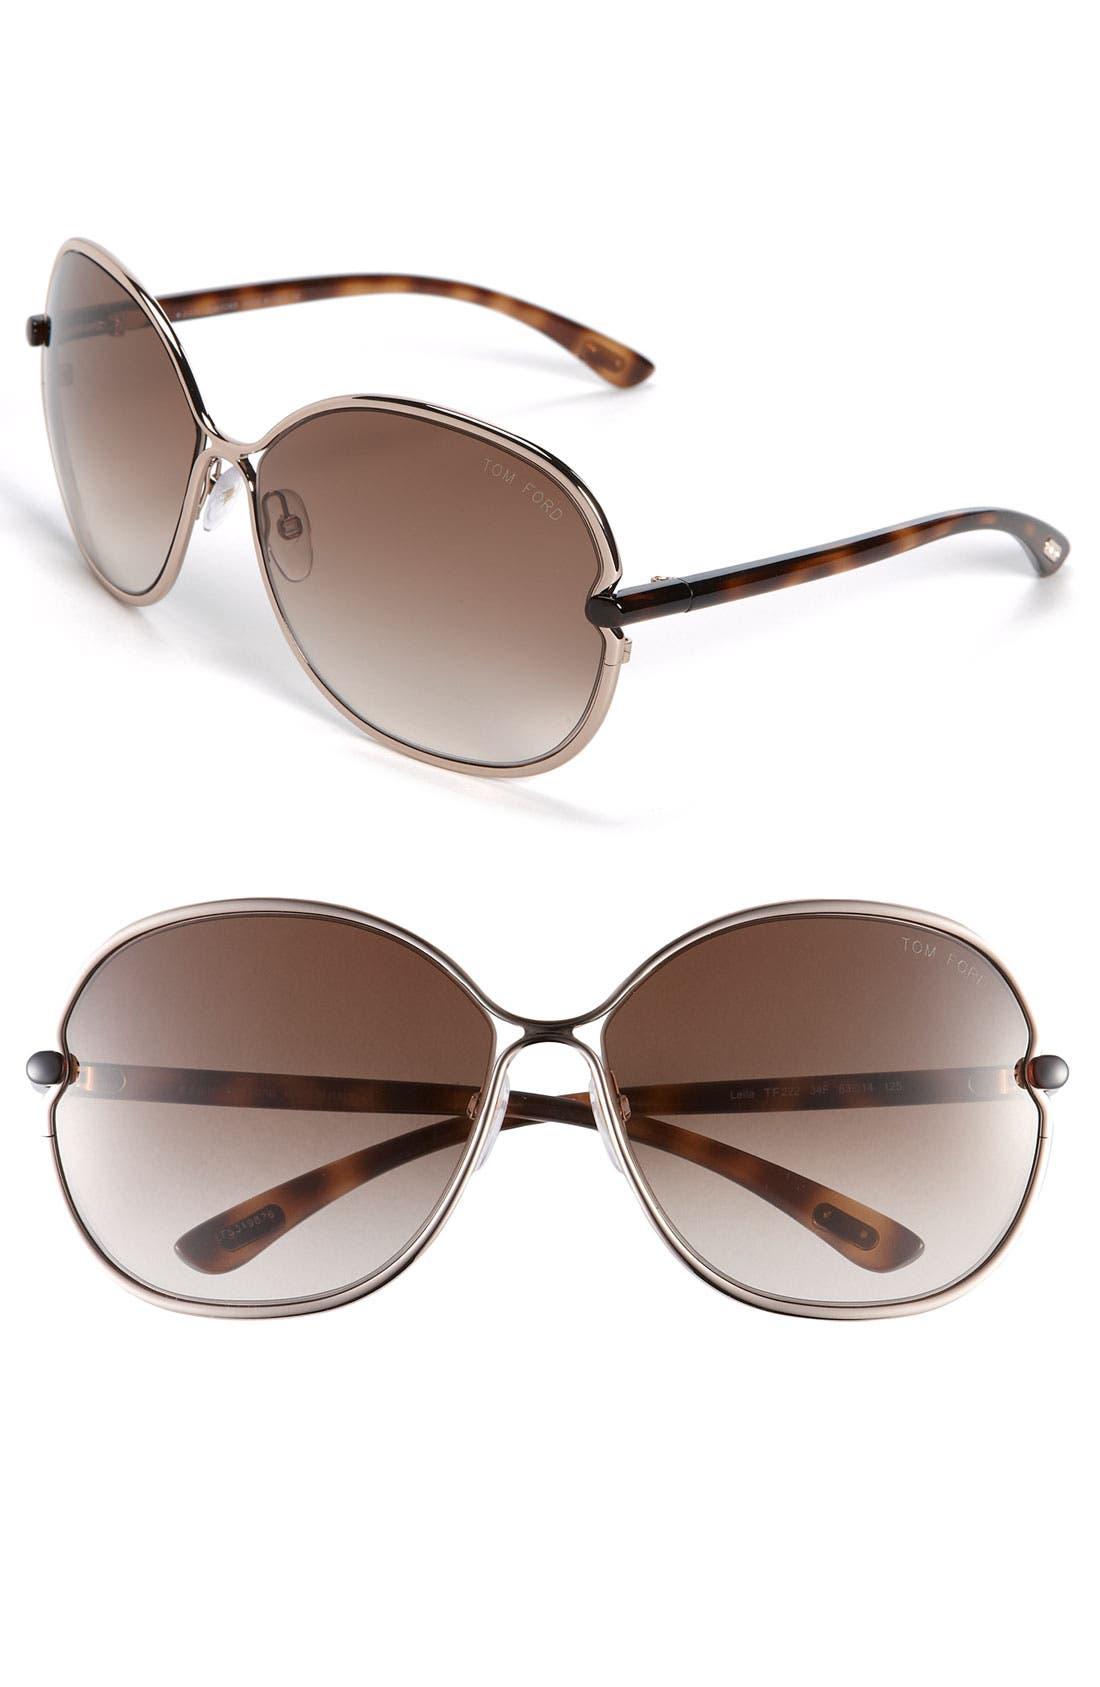 Alternate Image 1 Selected - Tom Ford 'Leila' Sunglasses